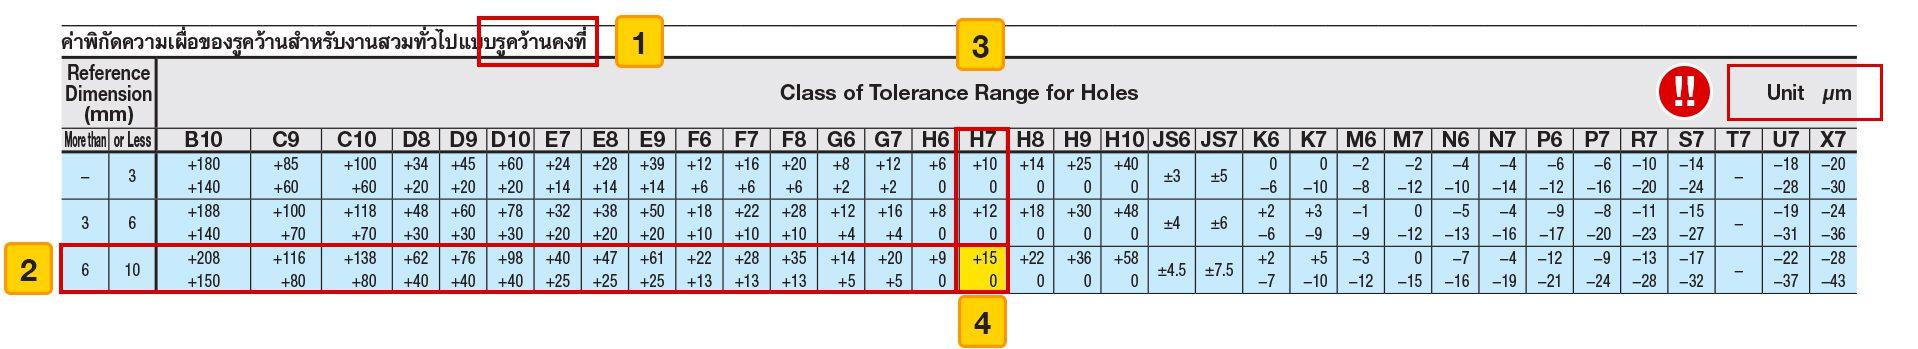 hole-and-shaft-basis